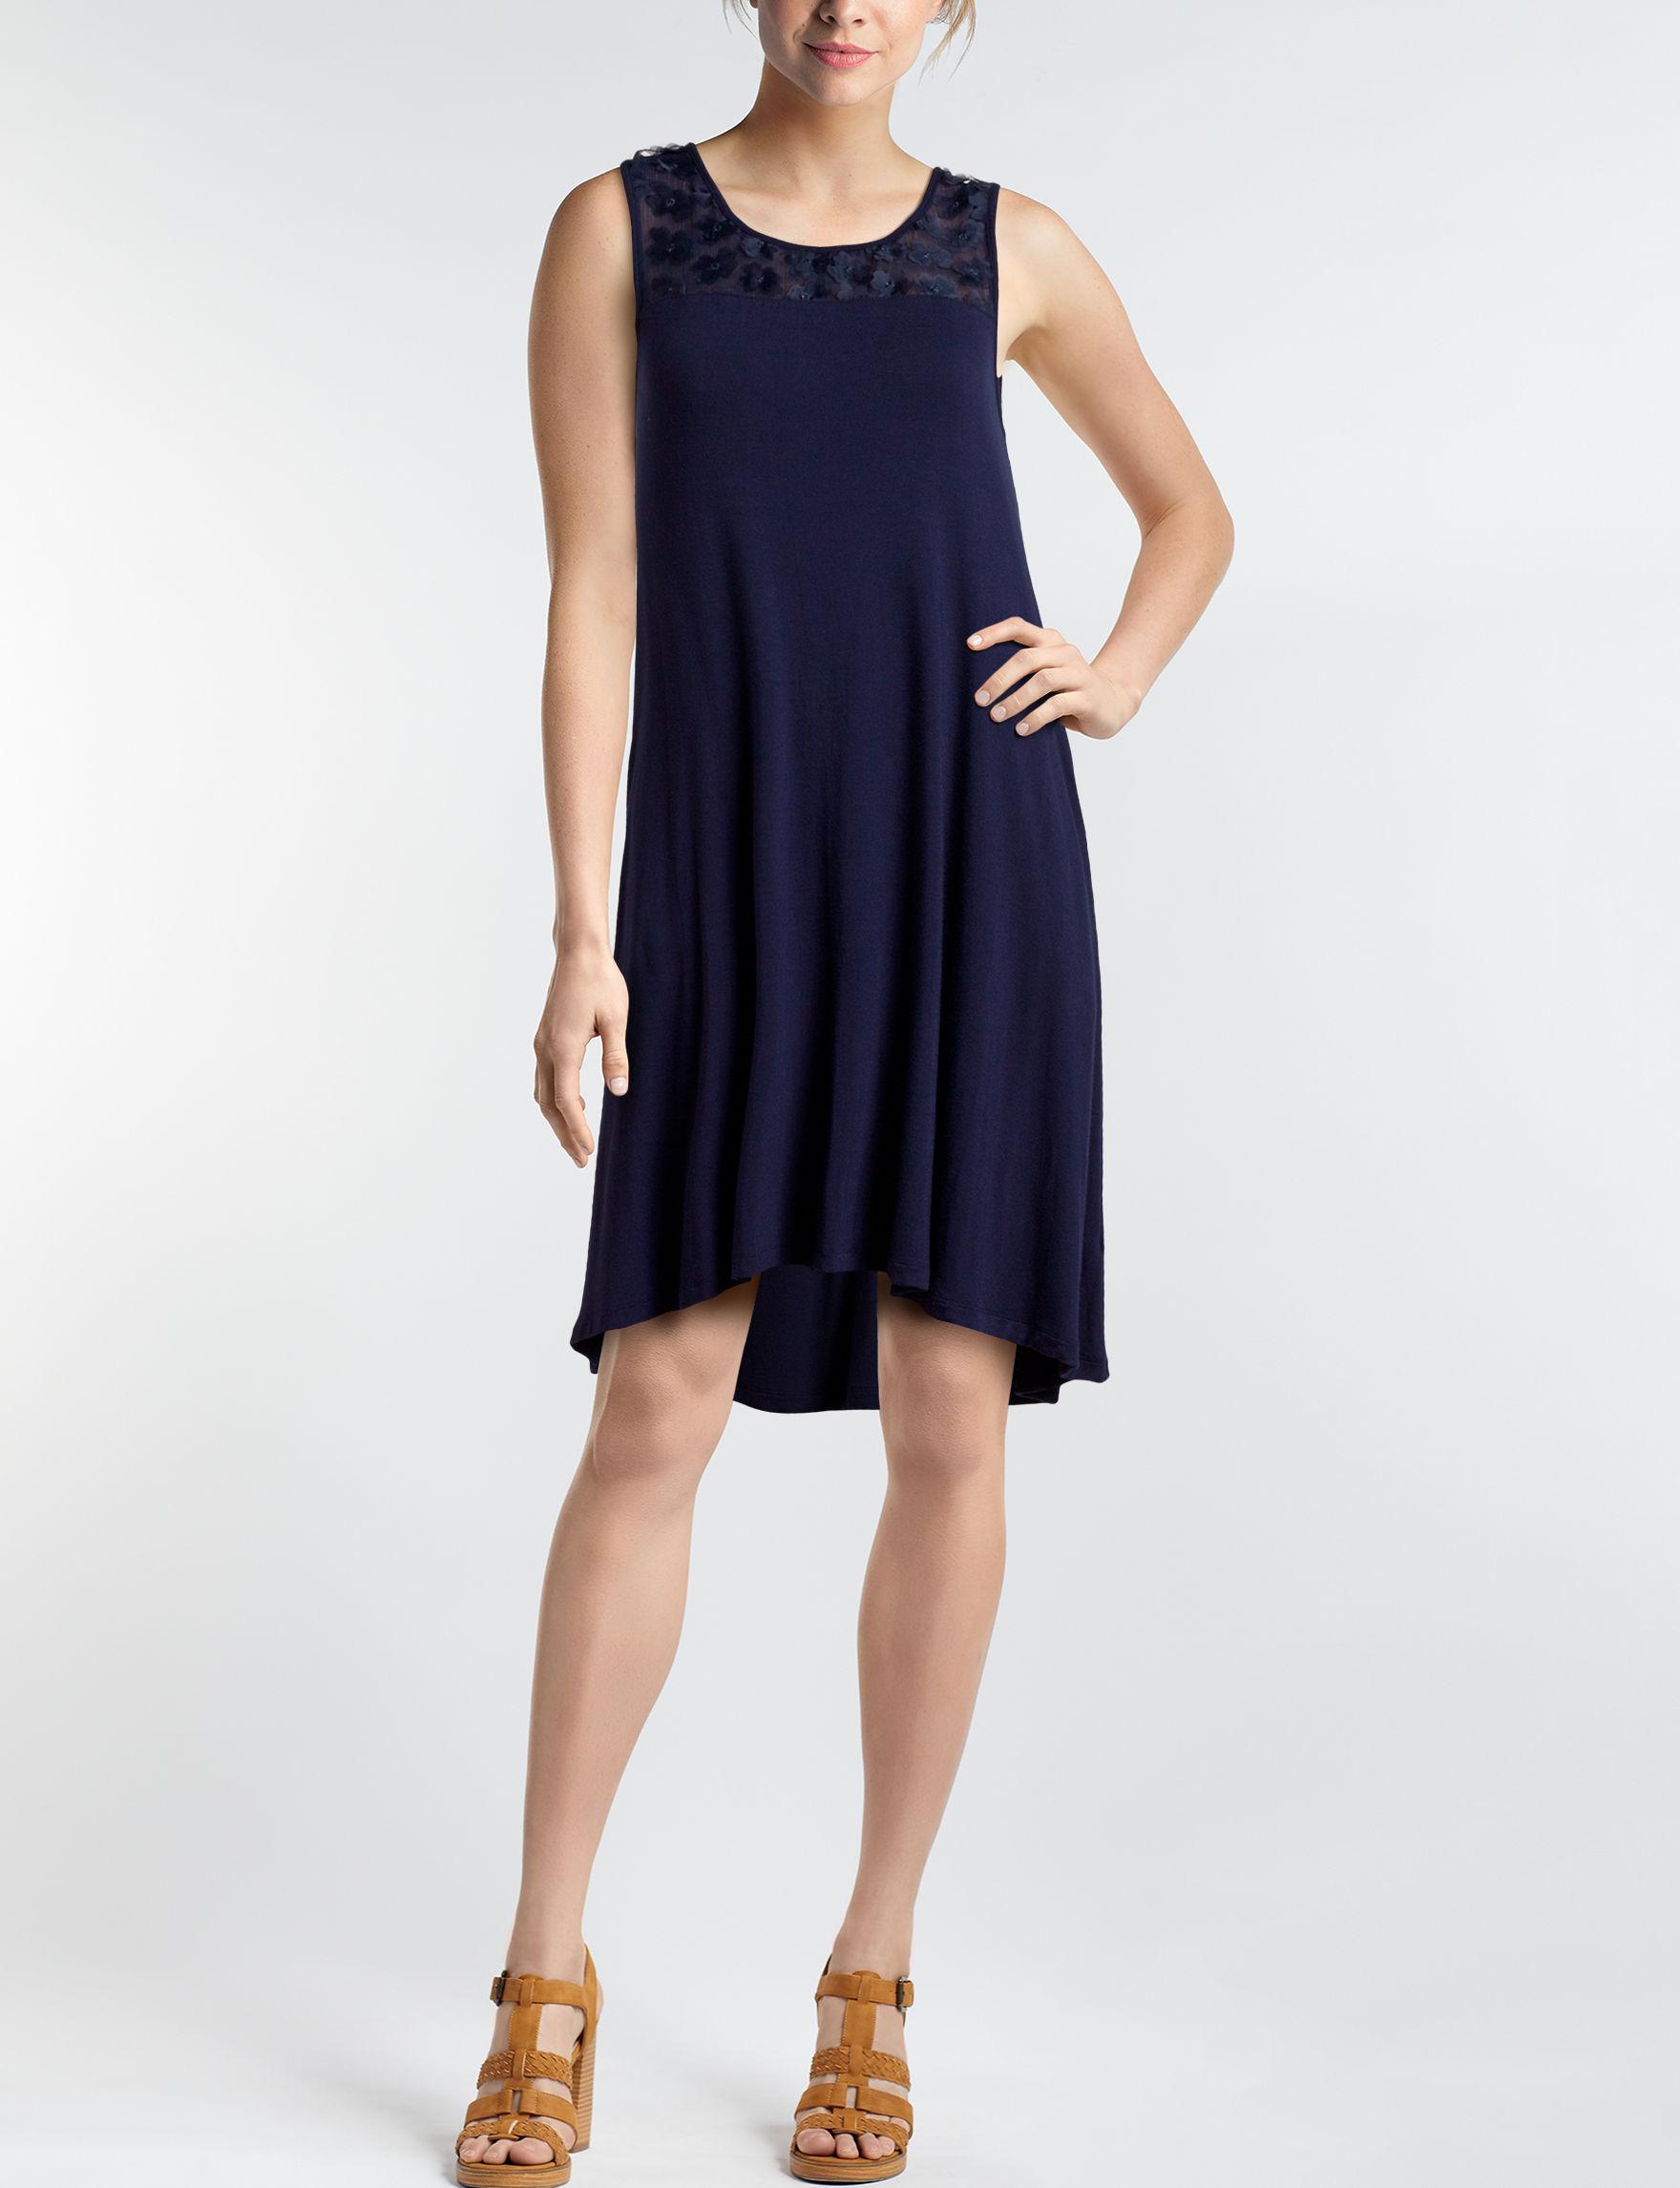 Nina Leonard Navy Everyday & Casual Fit & Flare Dresses